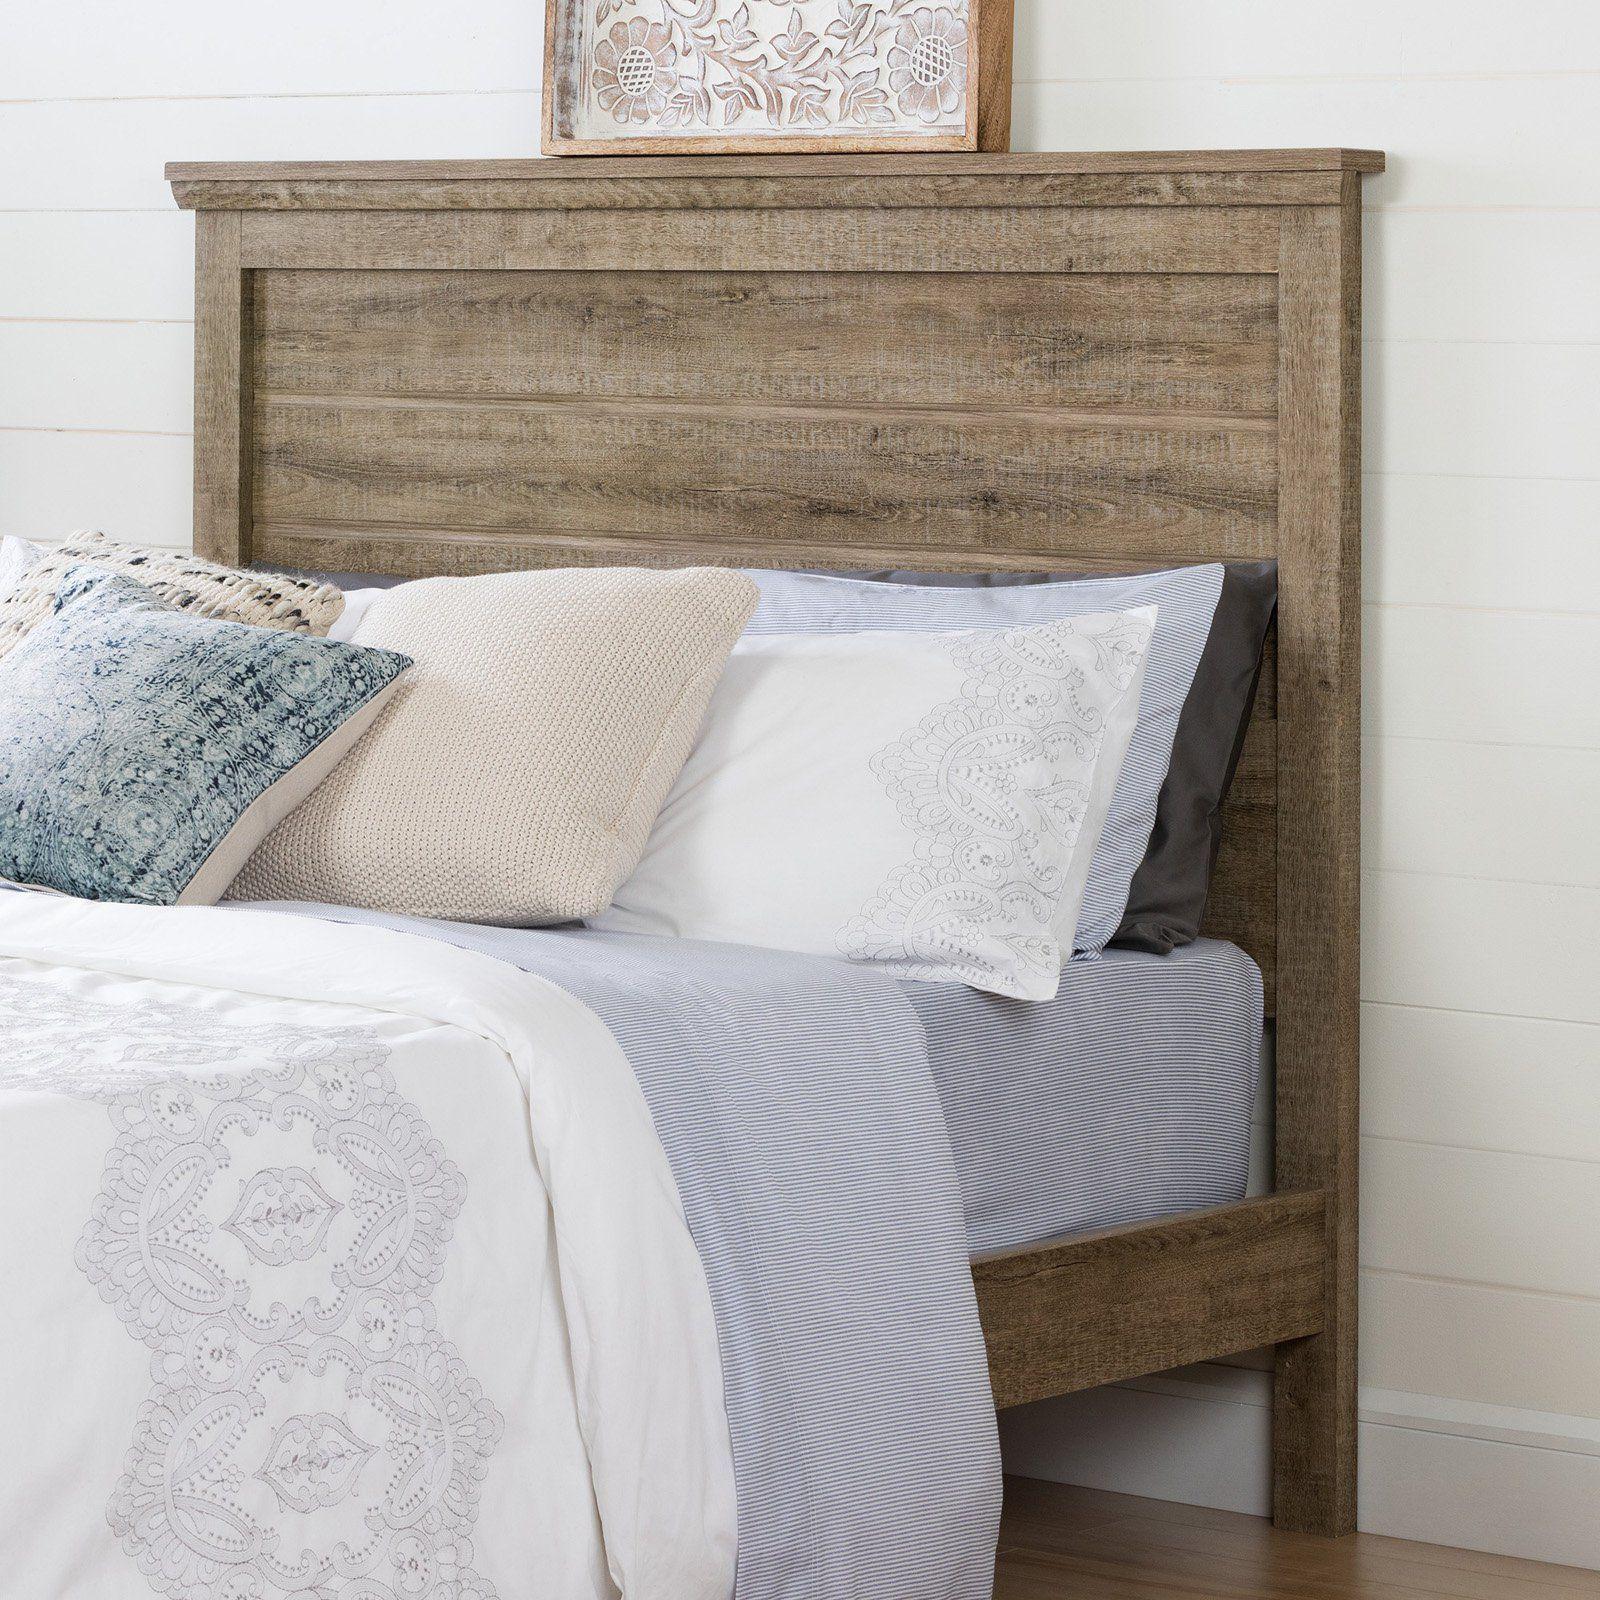 South Shore Lionel Queen Slat Headboard Rustic Master Bedroom